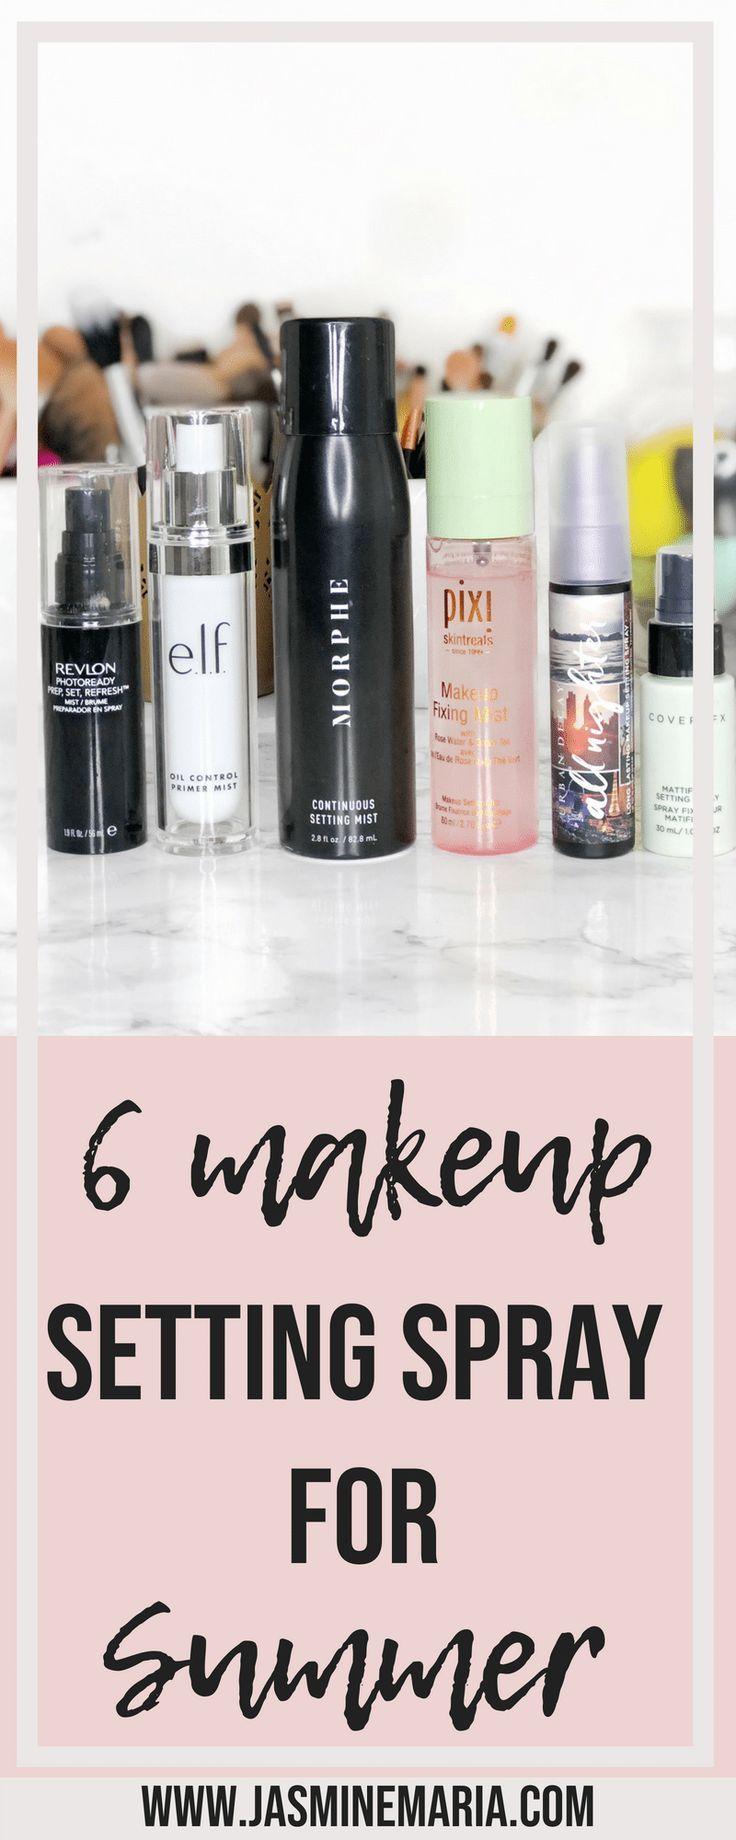 6 Makeup Setting Sprays for Summer #beauty #makeup #makeupsettingspray #settingspray #summerbeauty #summermakeup #summermakeuptips